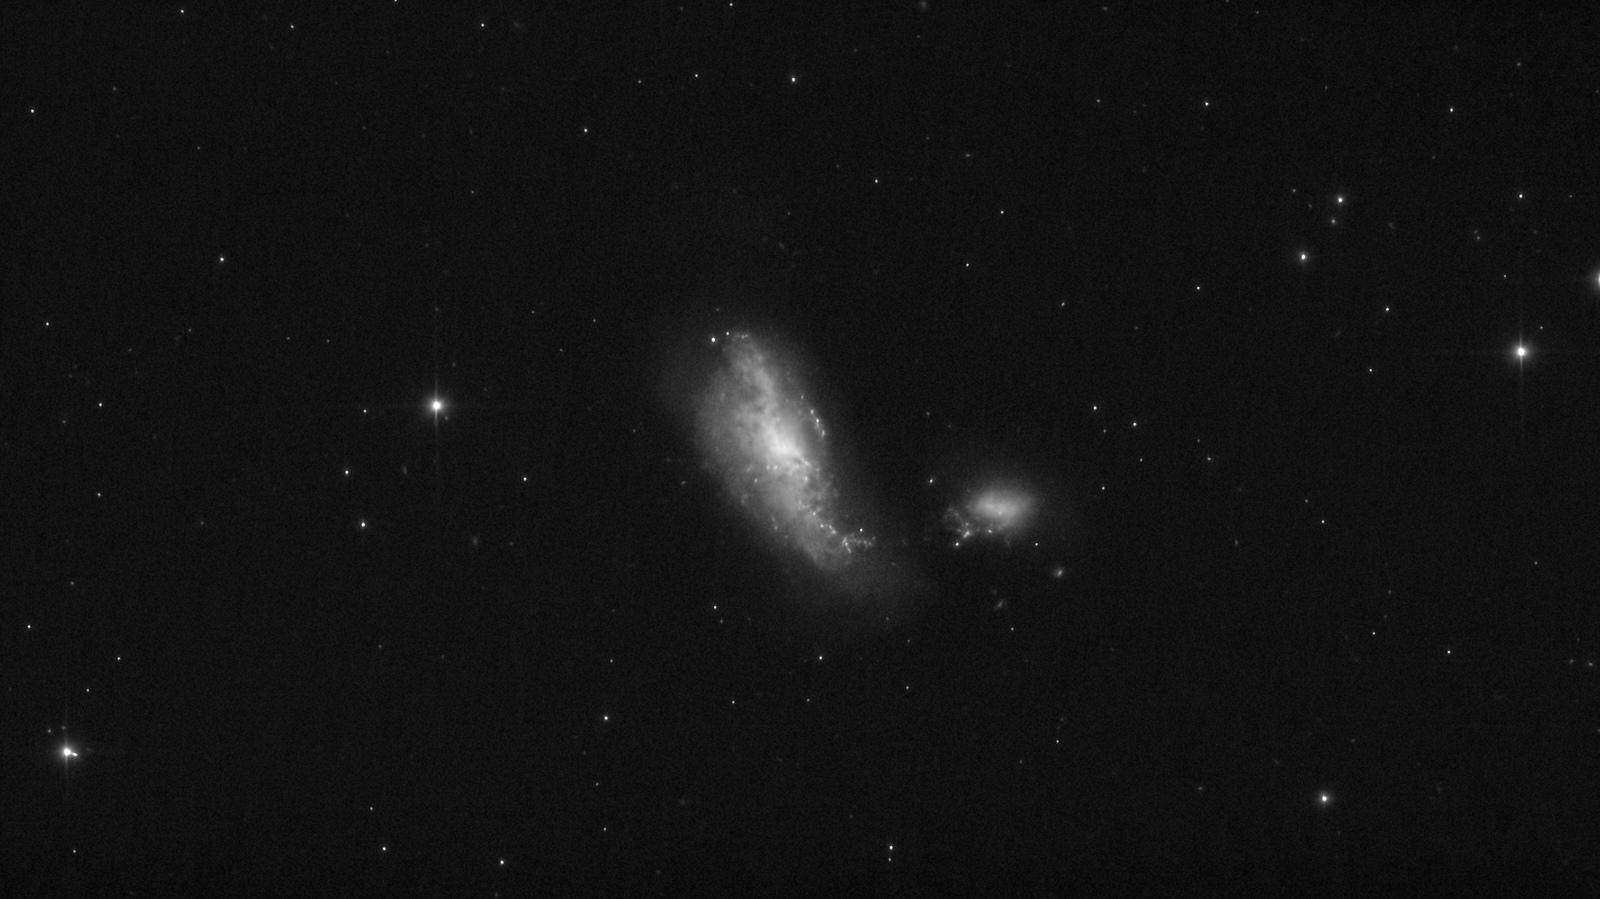 600c078fac538_r_pp_NGC4490_stacked.jpg.0c7840cece44691a1364915d871de1dc.jpg